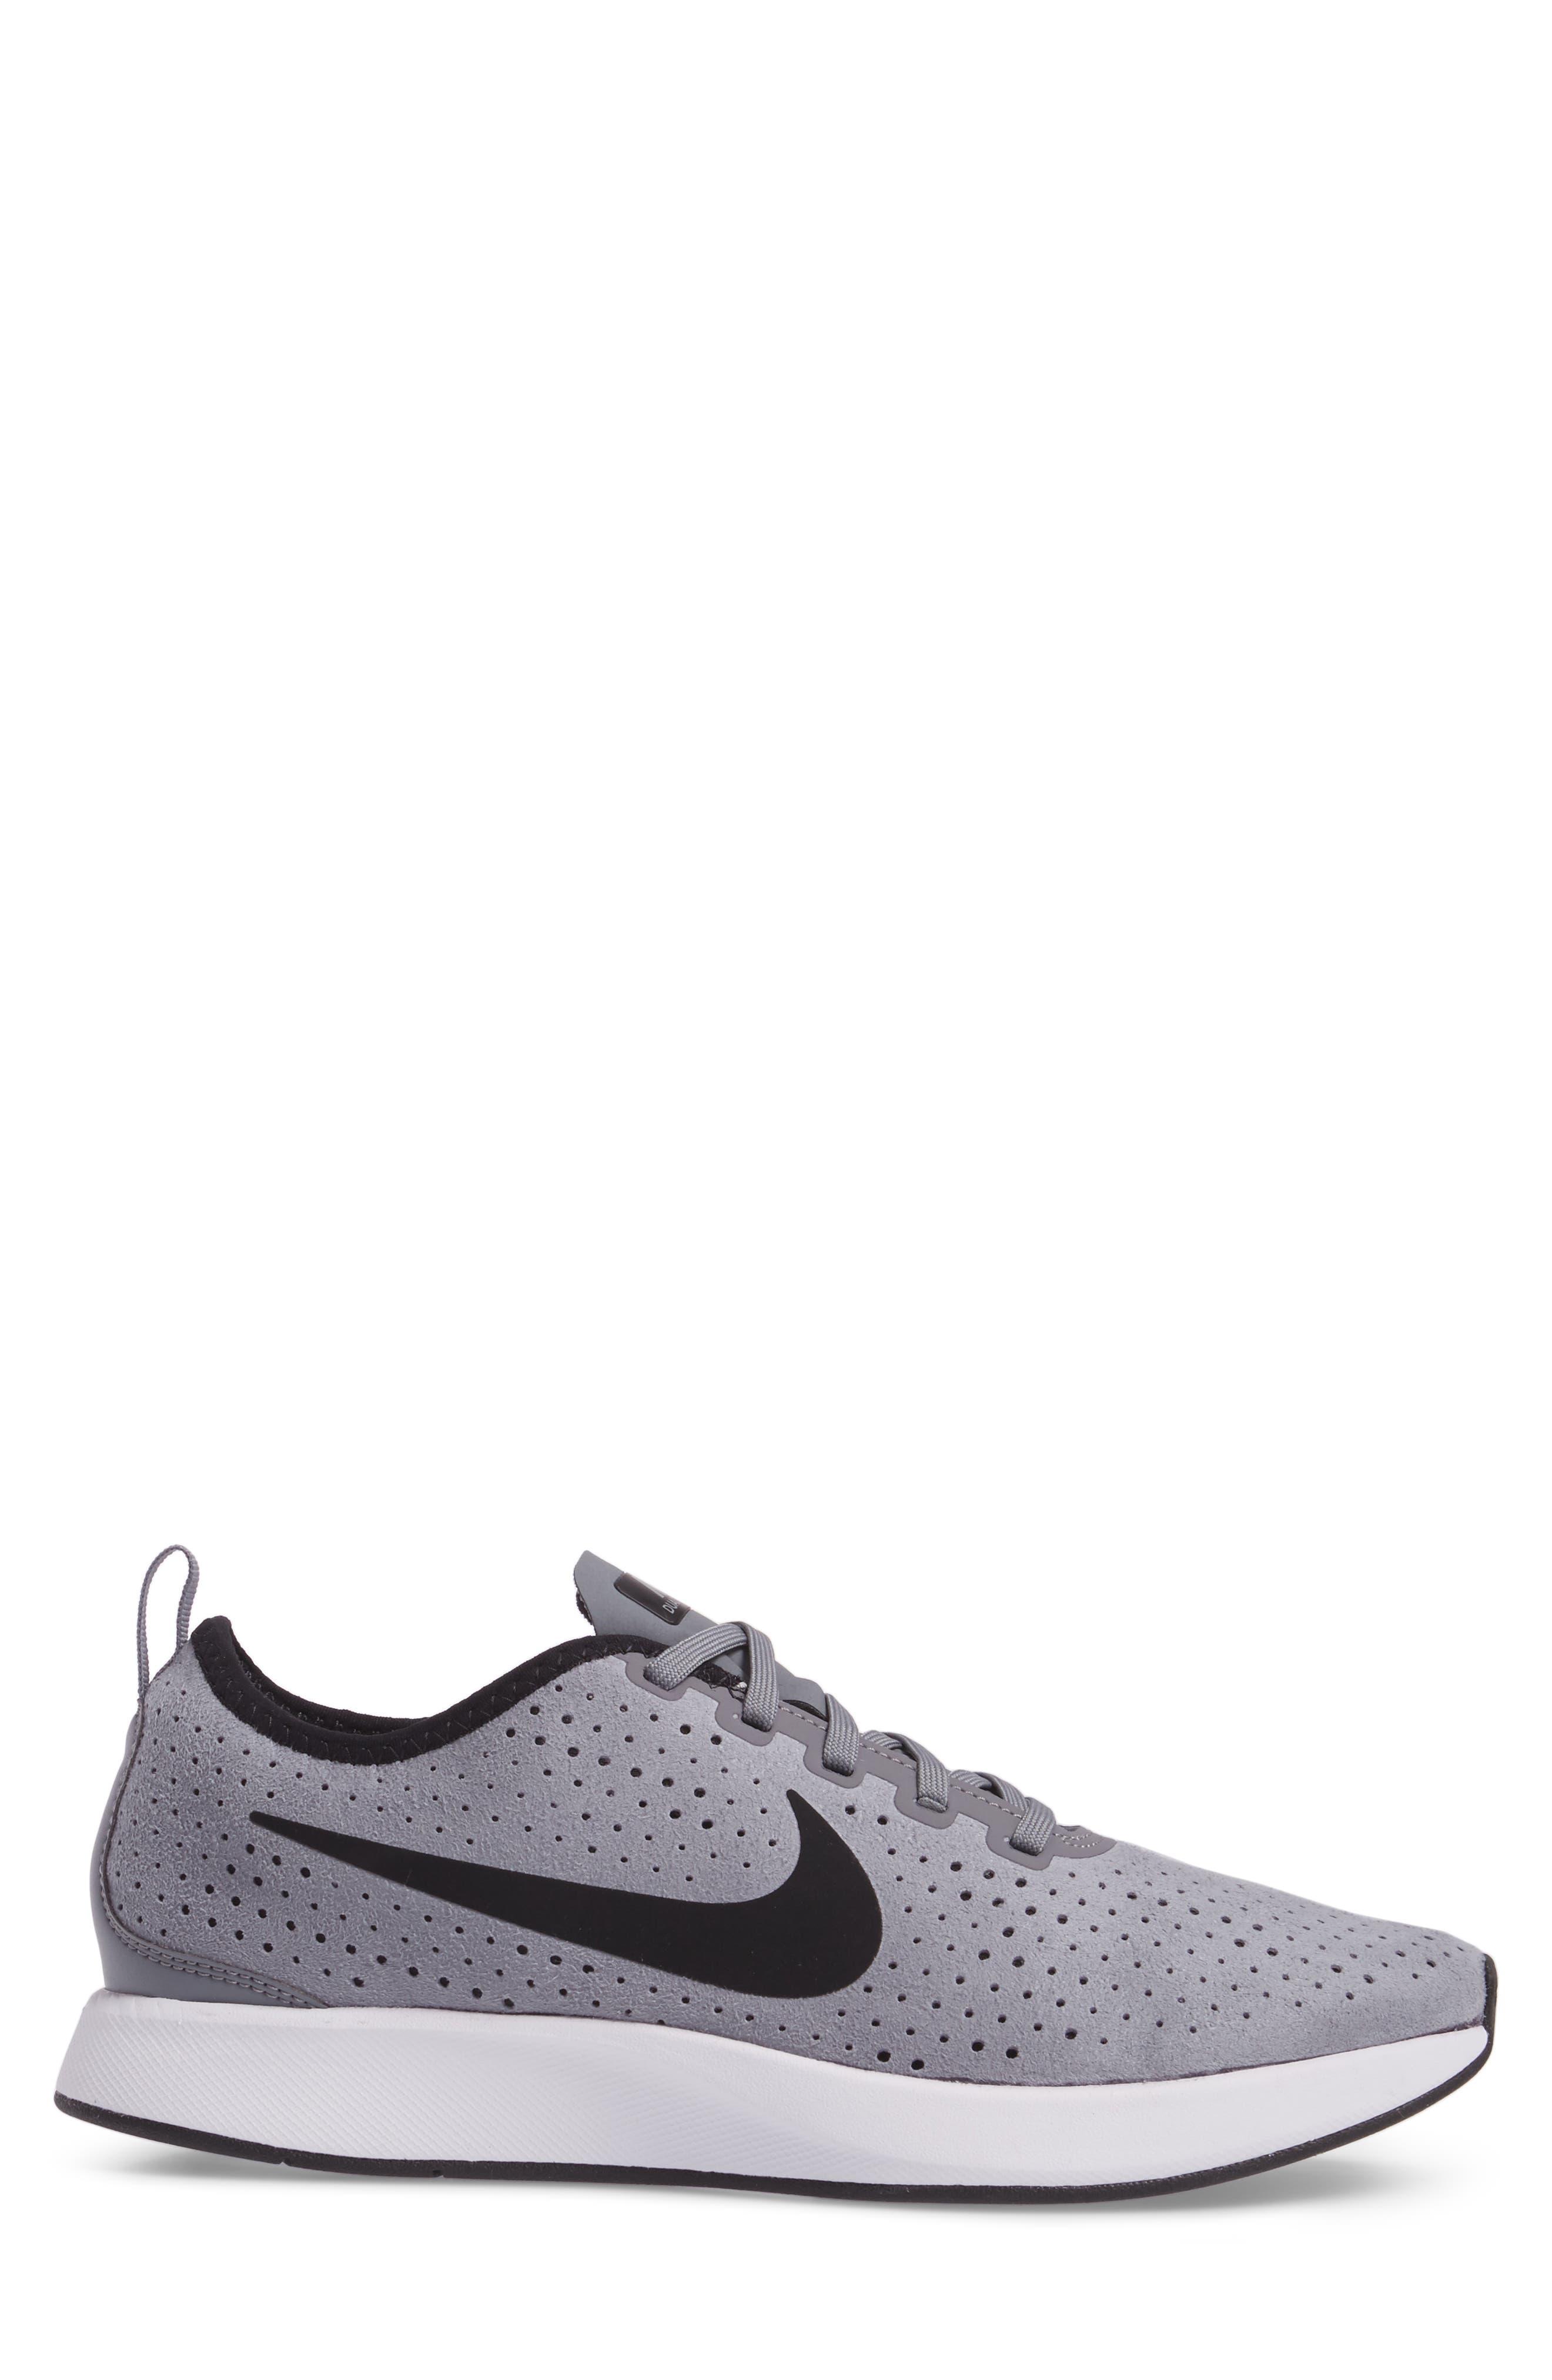 Alternate Image 3  - Nike Dualtone Racer Premium Sneaker (Men)